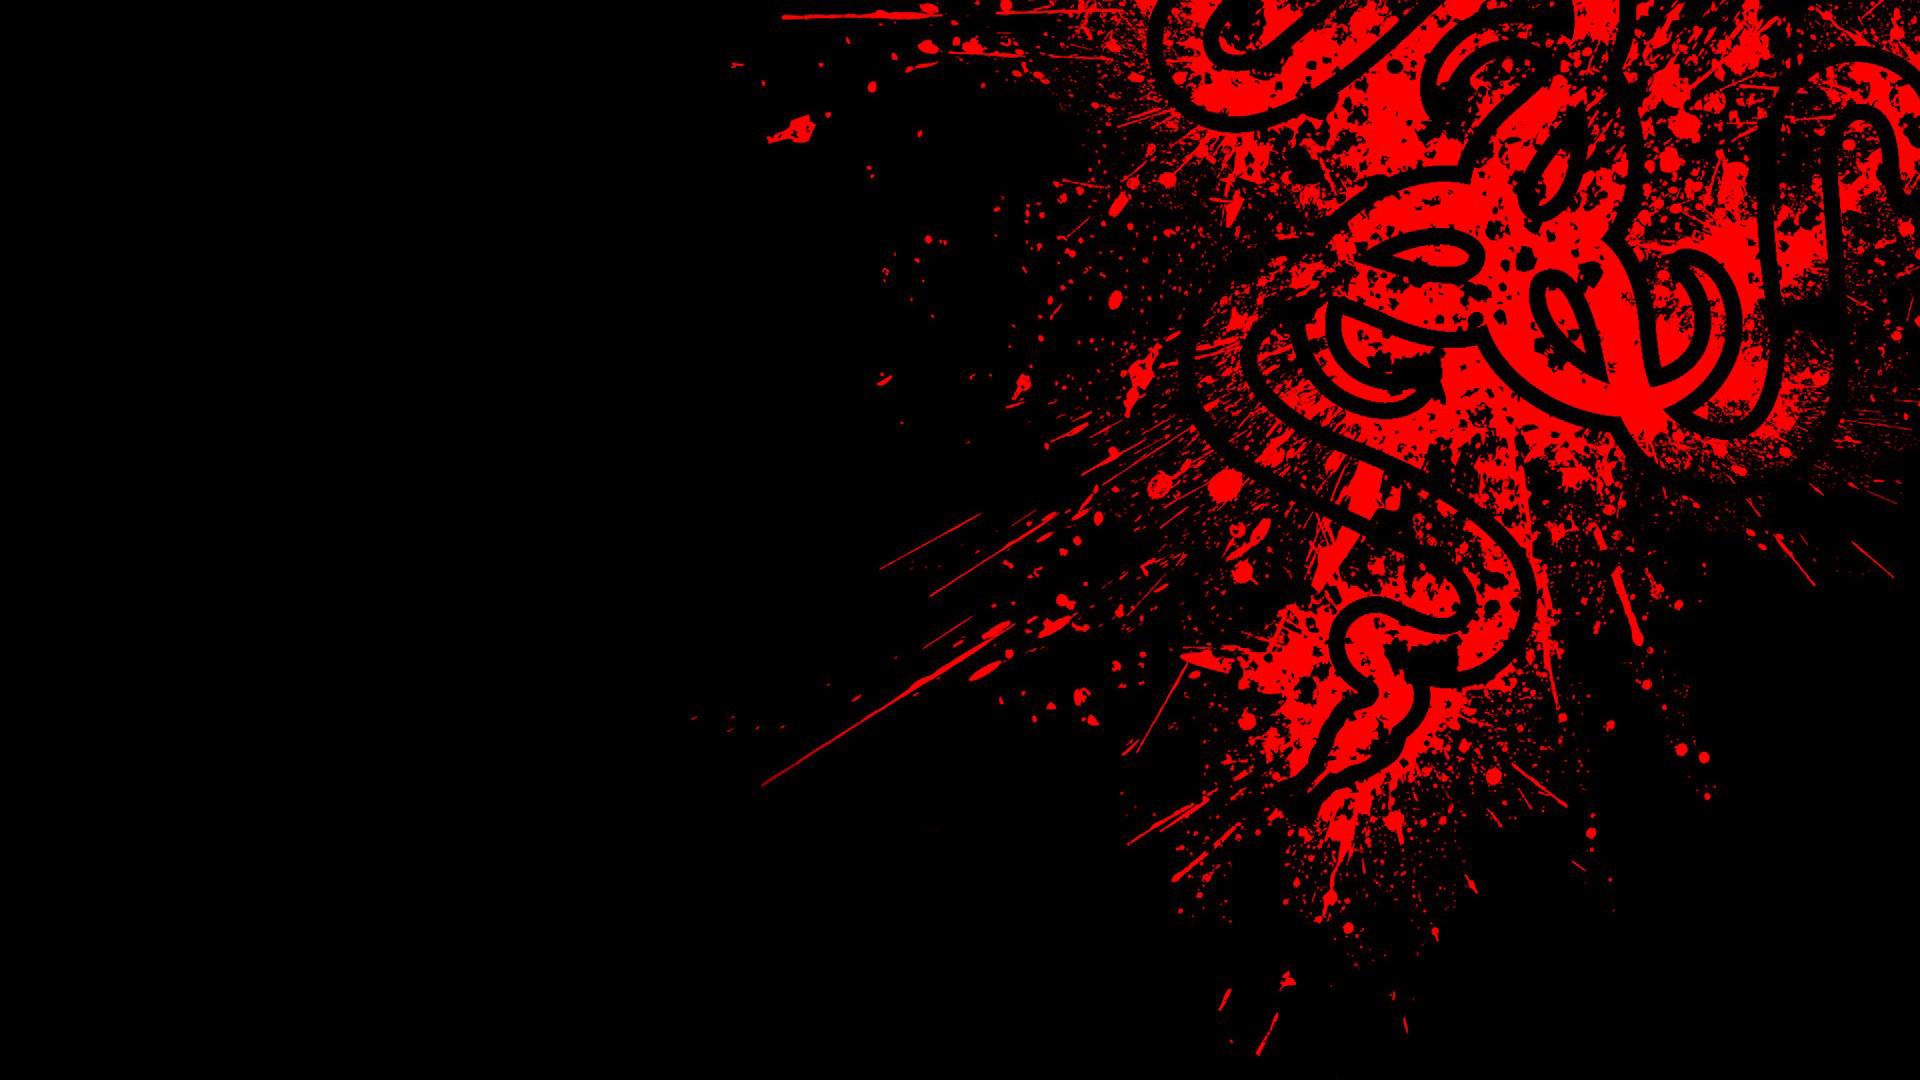 69+ Red Razer Wallpaper HD